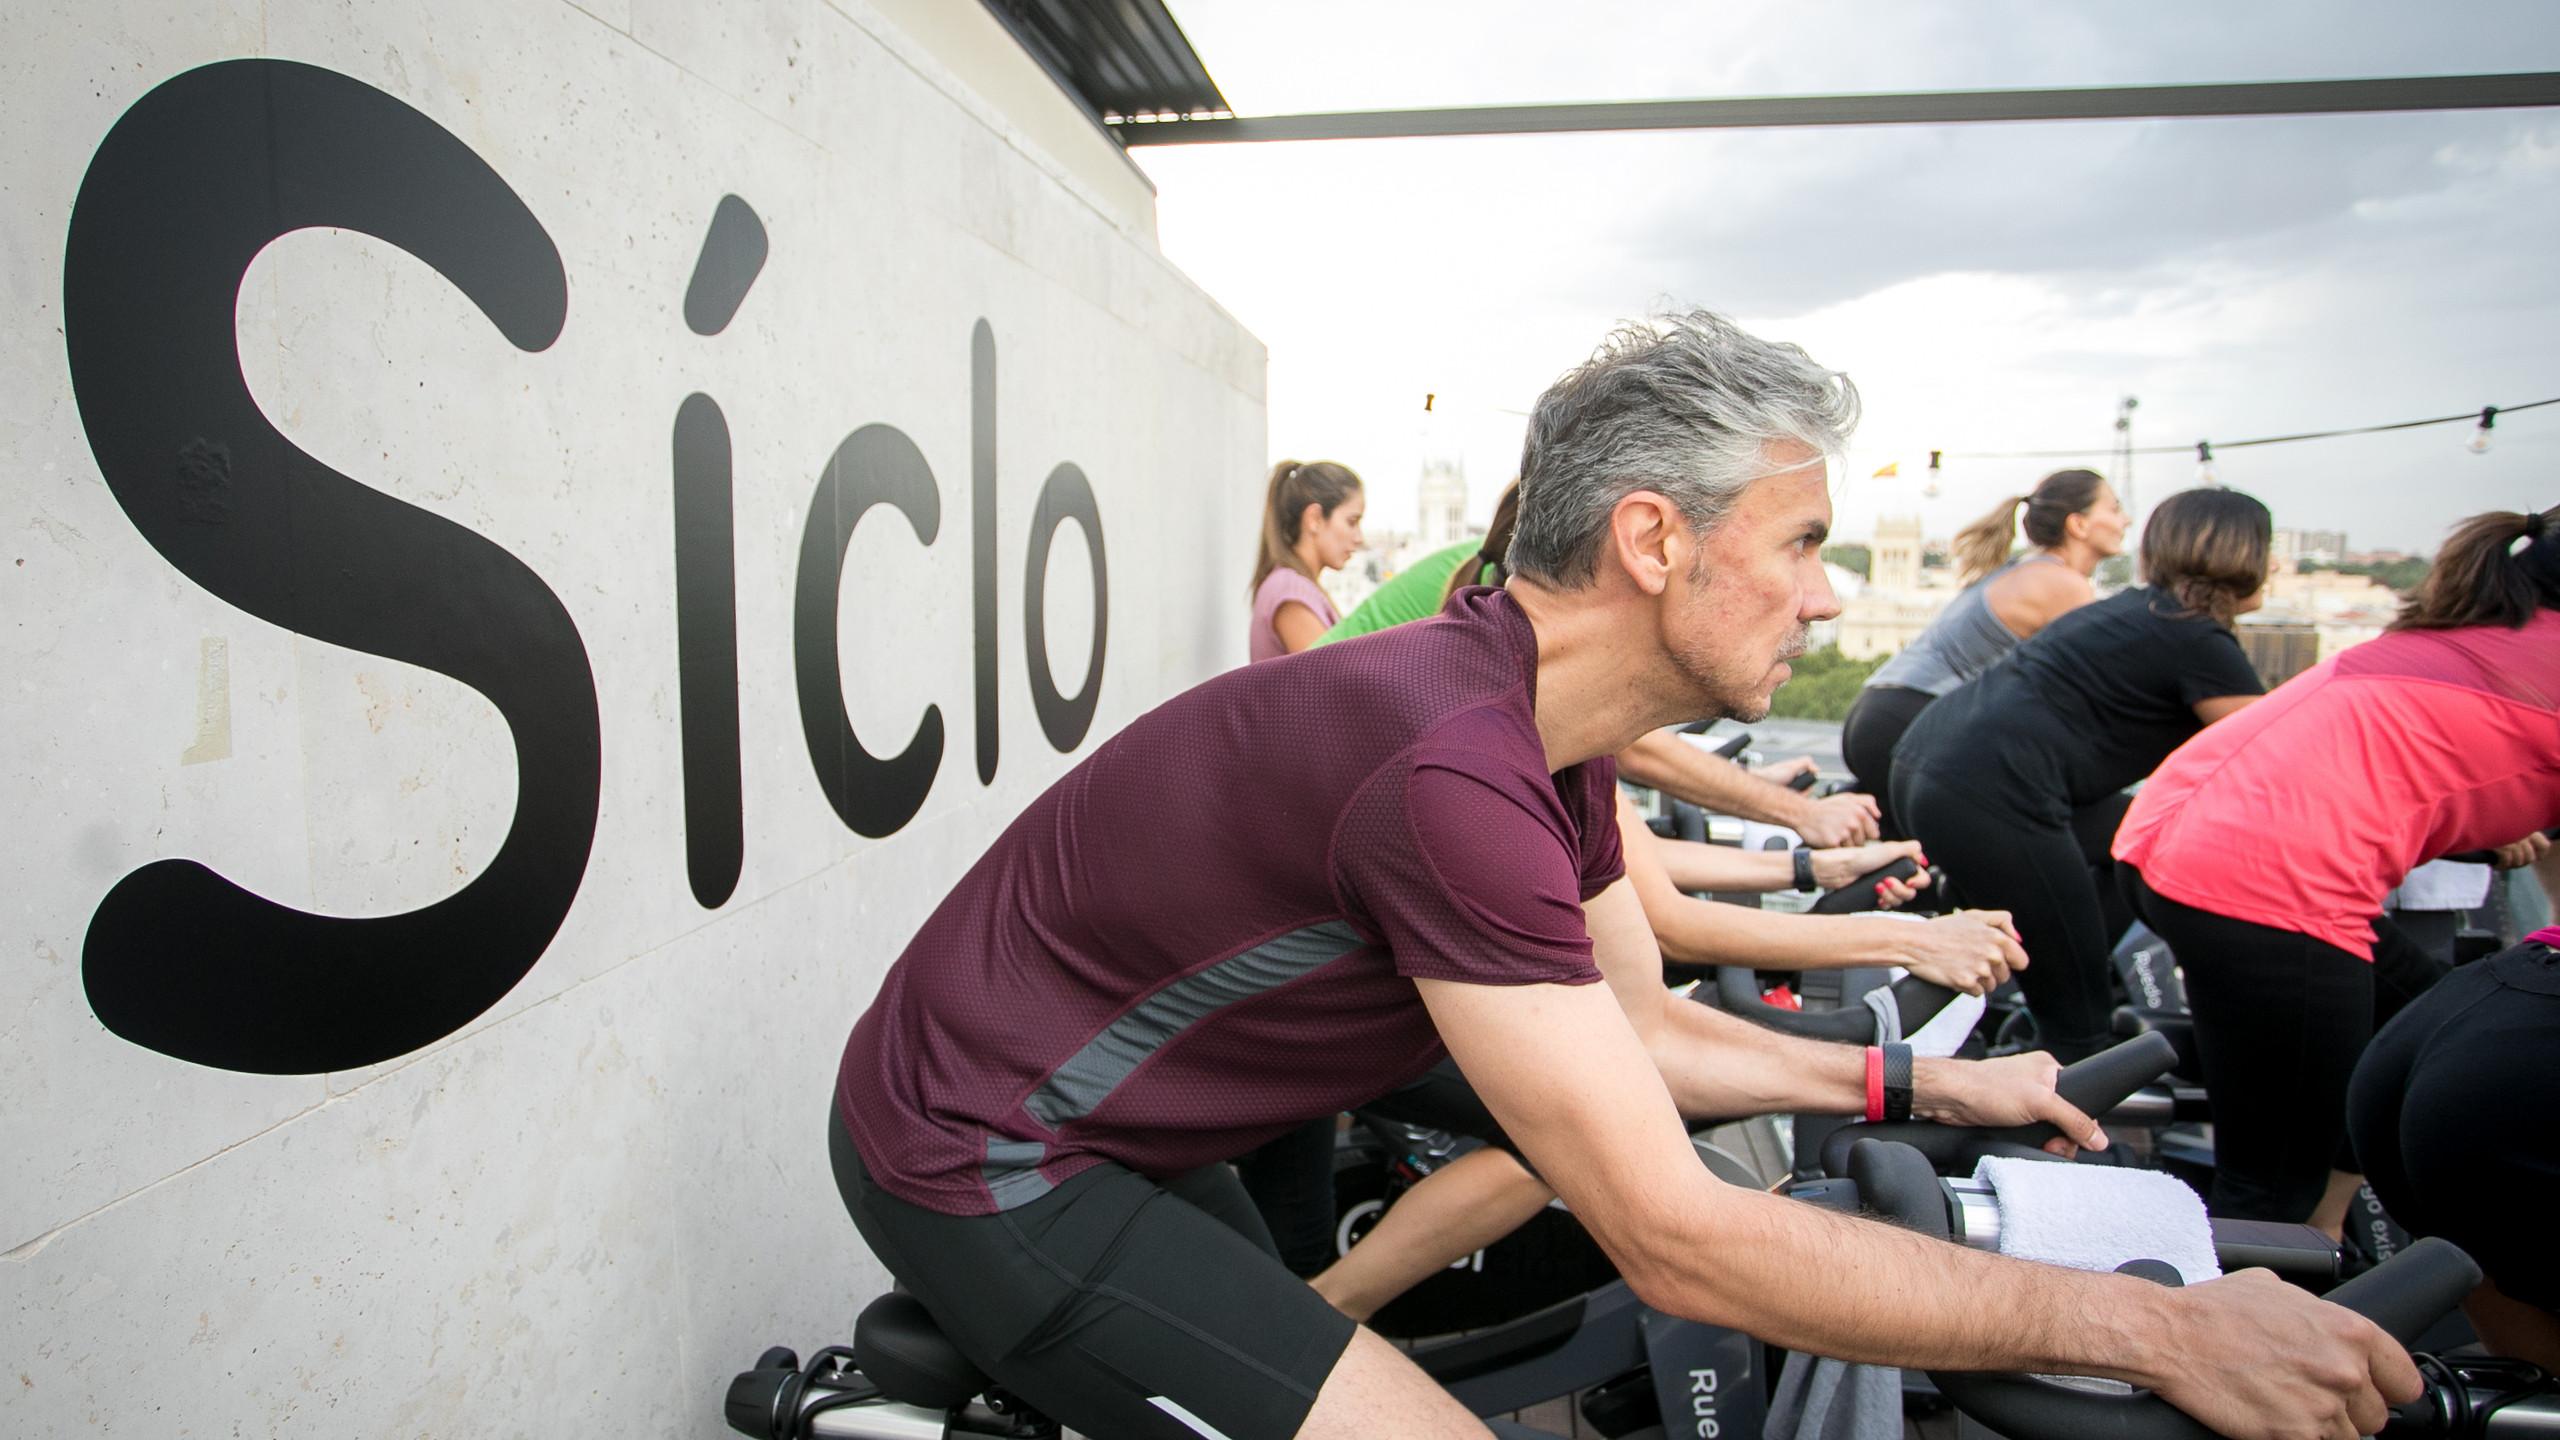 SICLO CASA SUECIA030